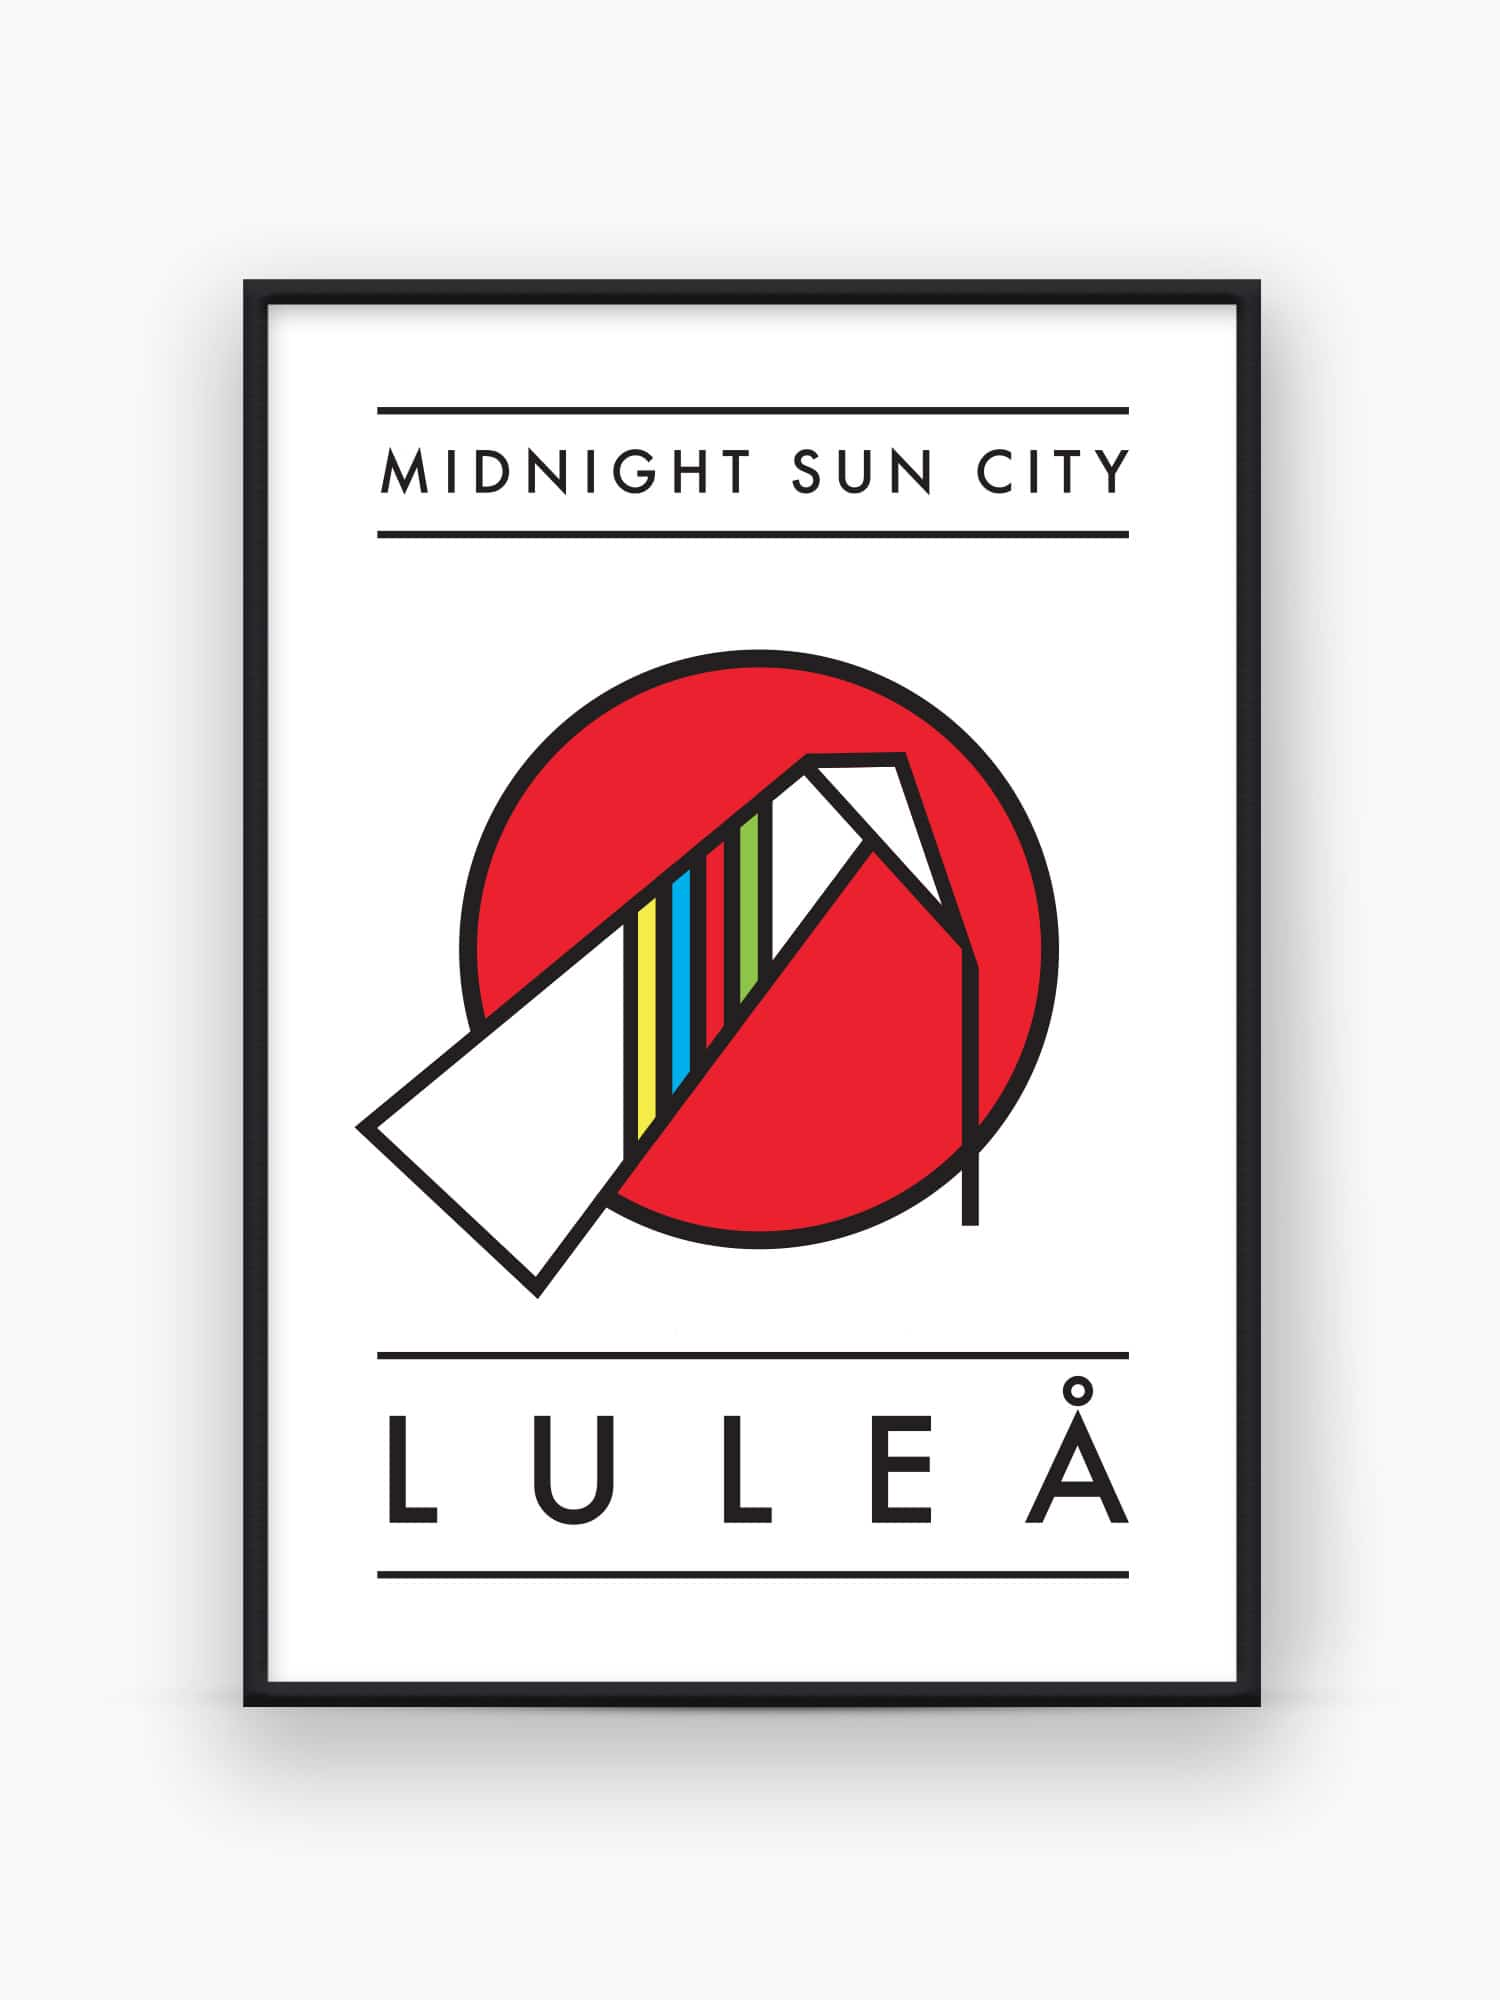 Midnight Sun City Luleå Poster / Affisch / Tavla - Burban Studios